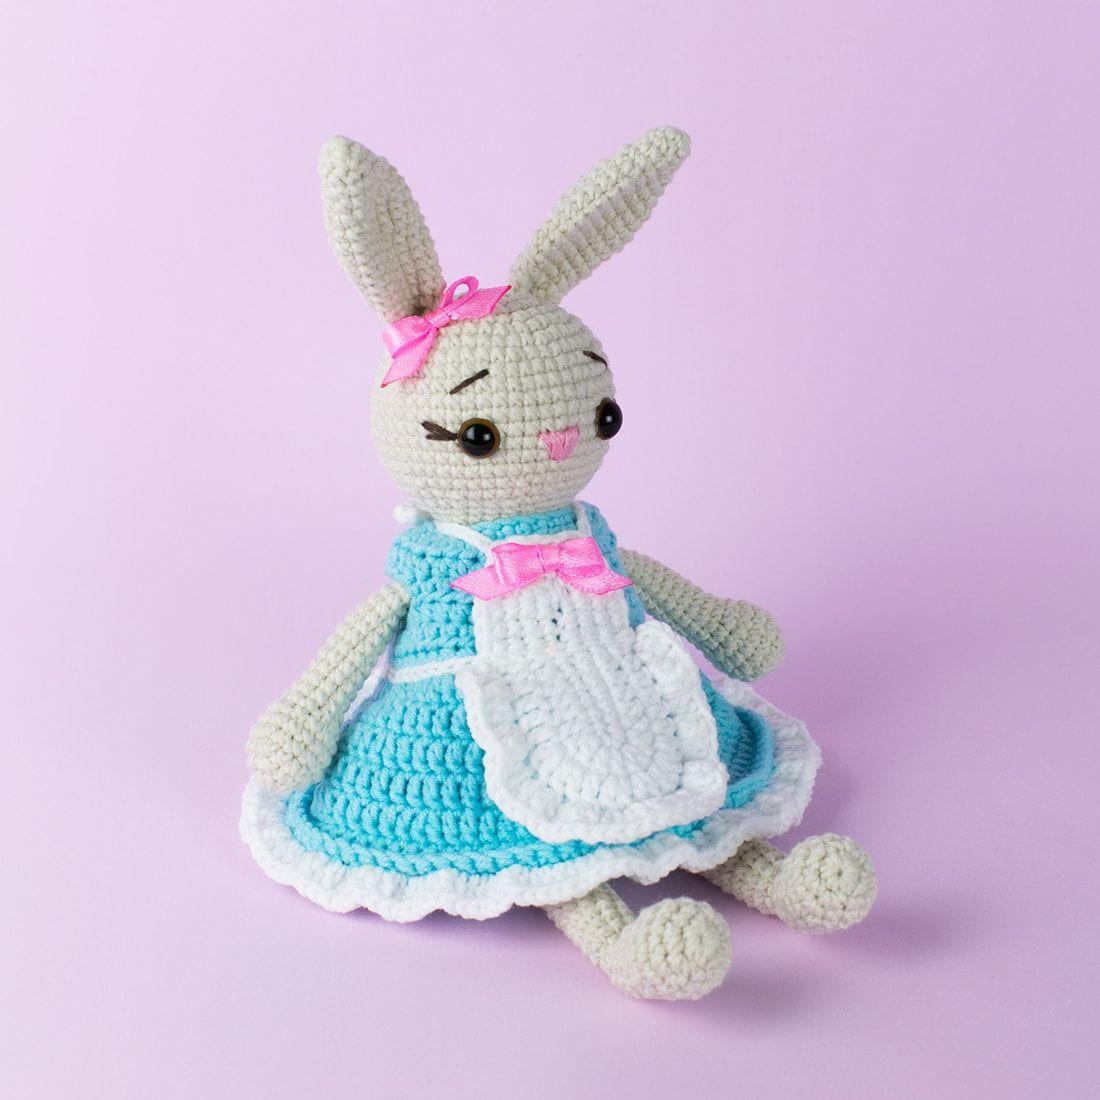 Free Amigurumi Bunny Crochet Patterns   Easter crochet patterns ...   1100x1100